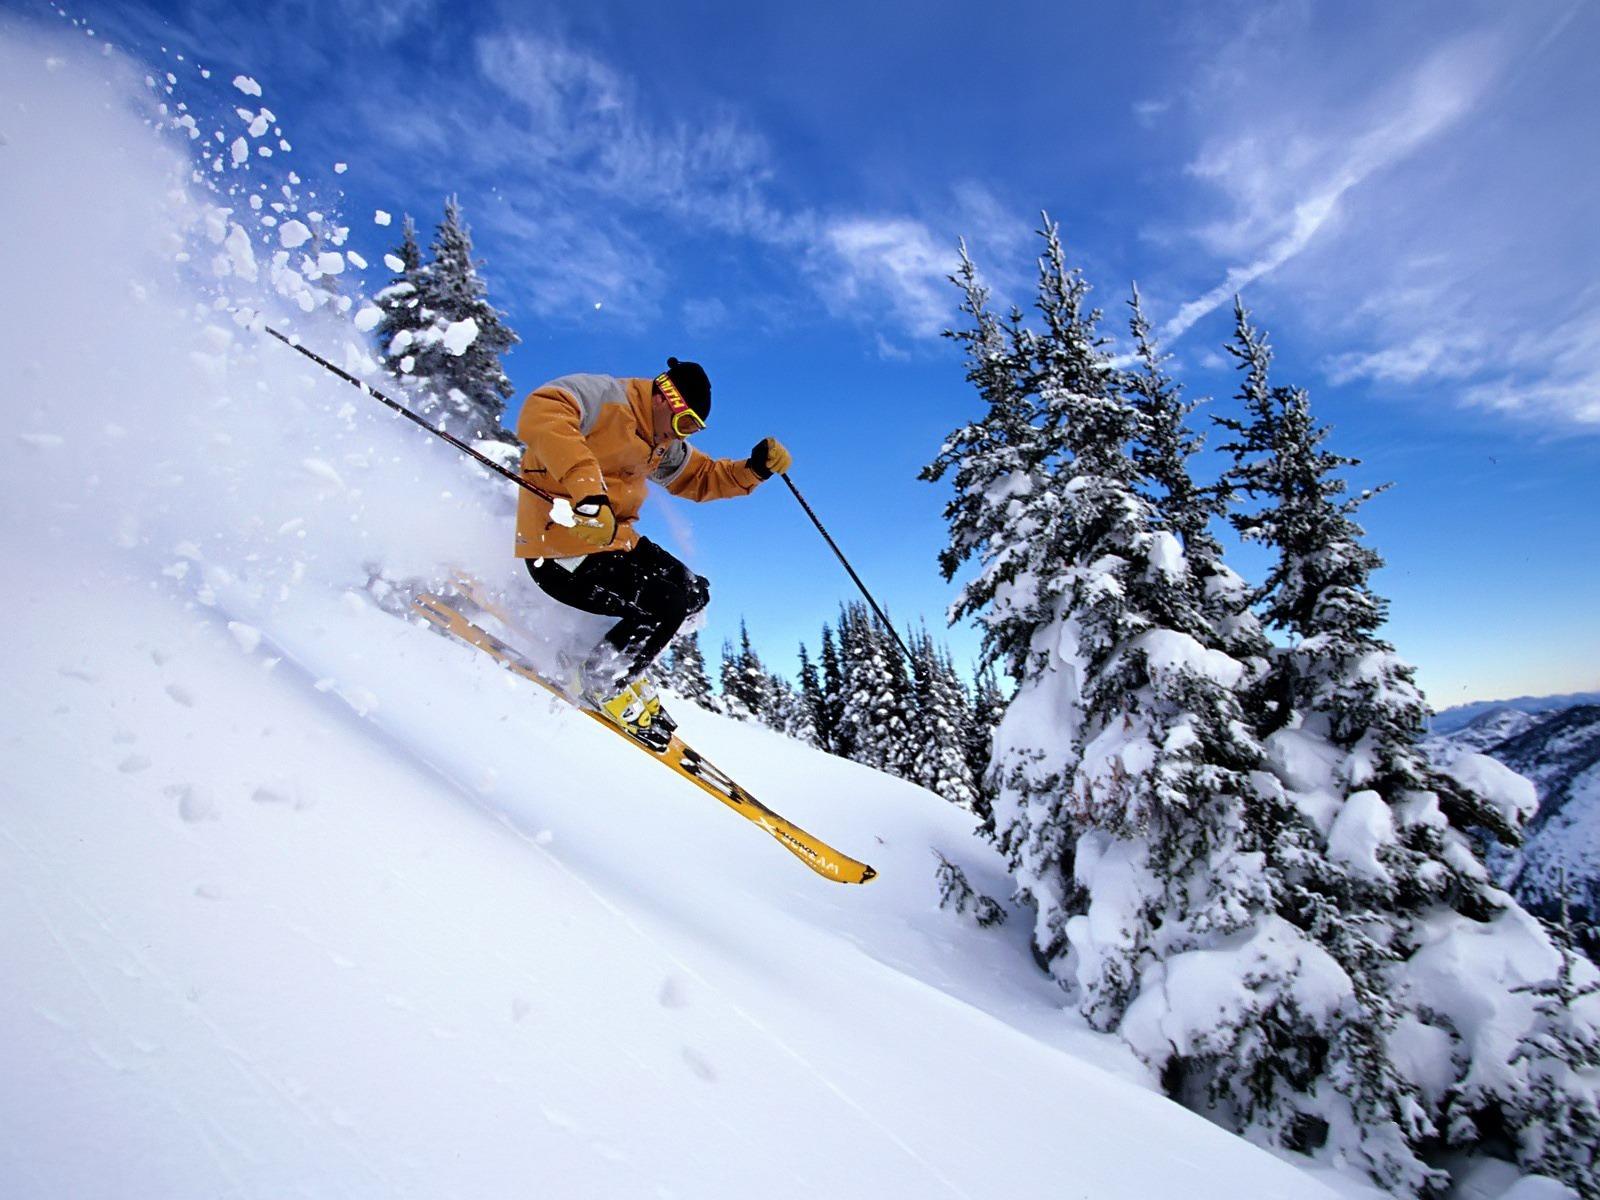 ski wallpaper ski sports wallpapers in jpg format for free download